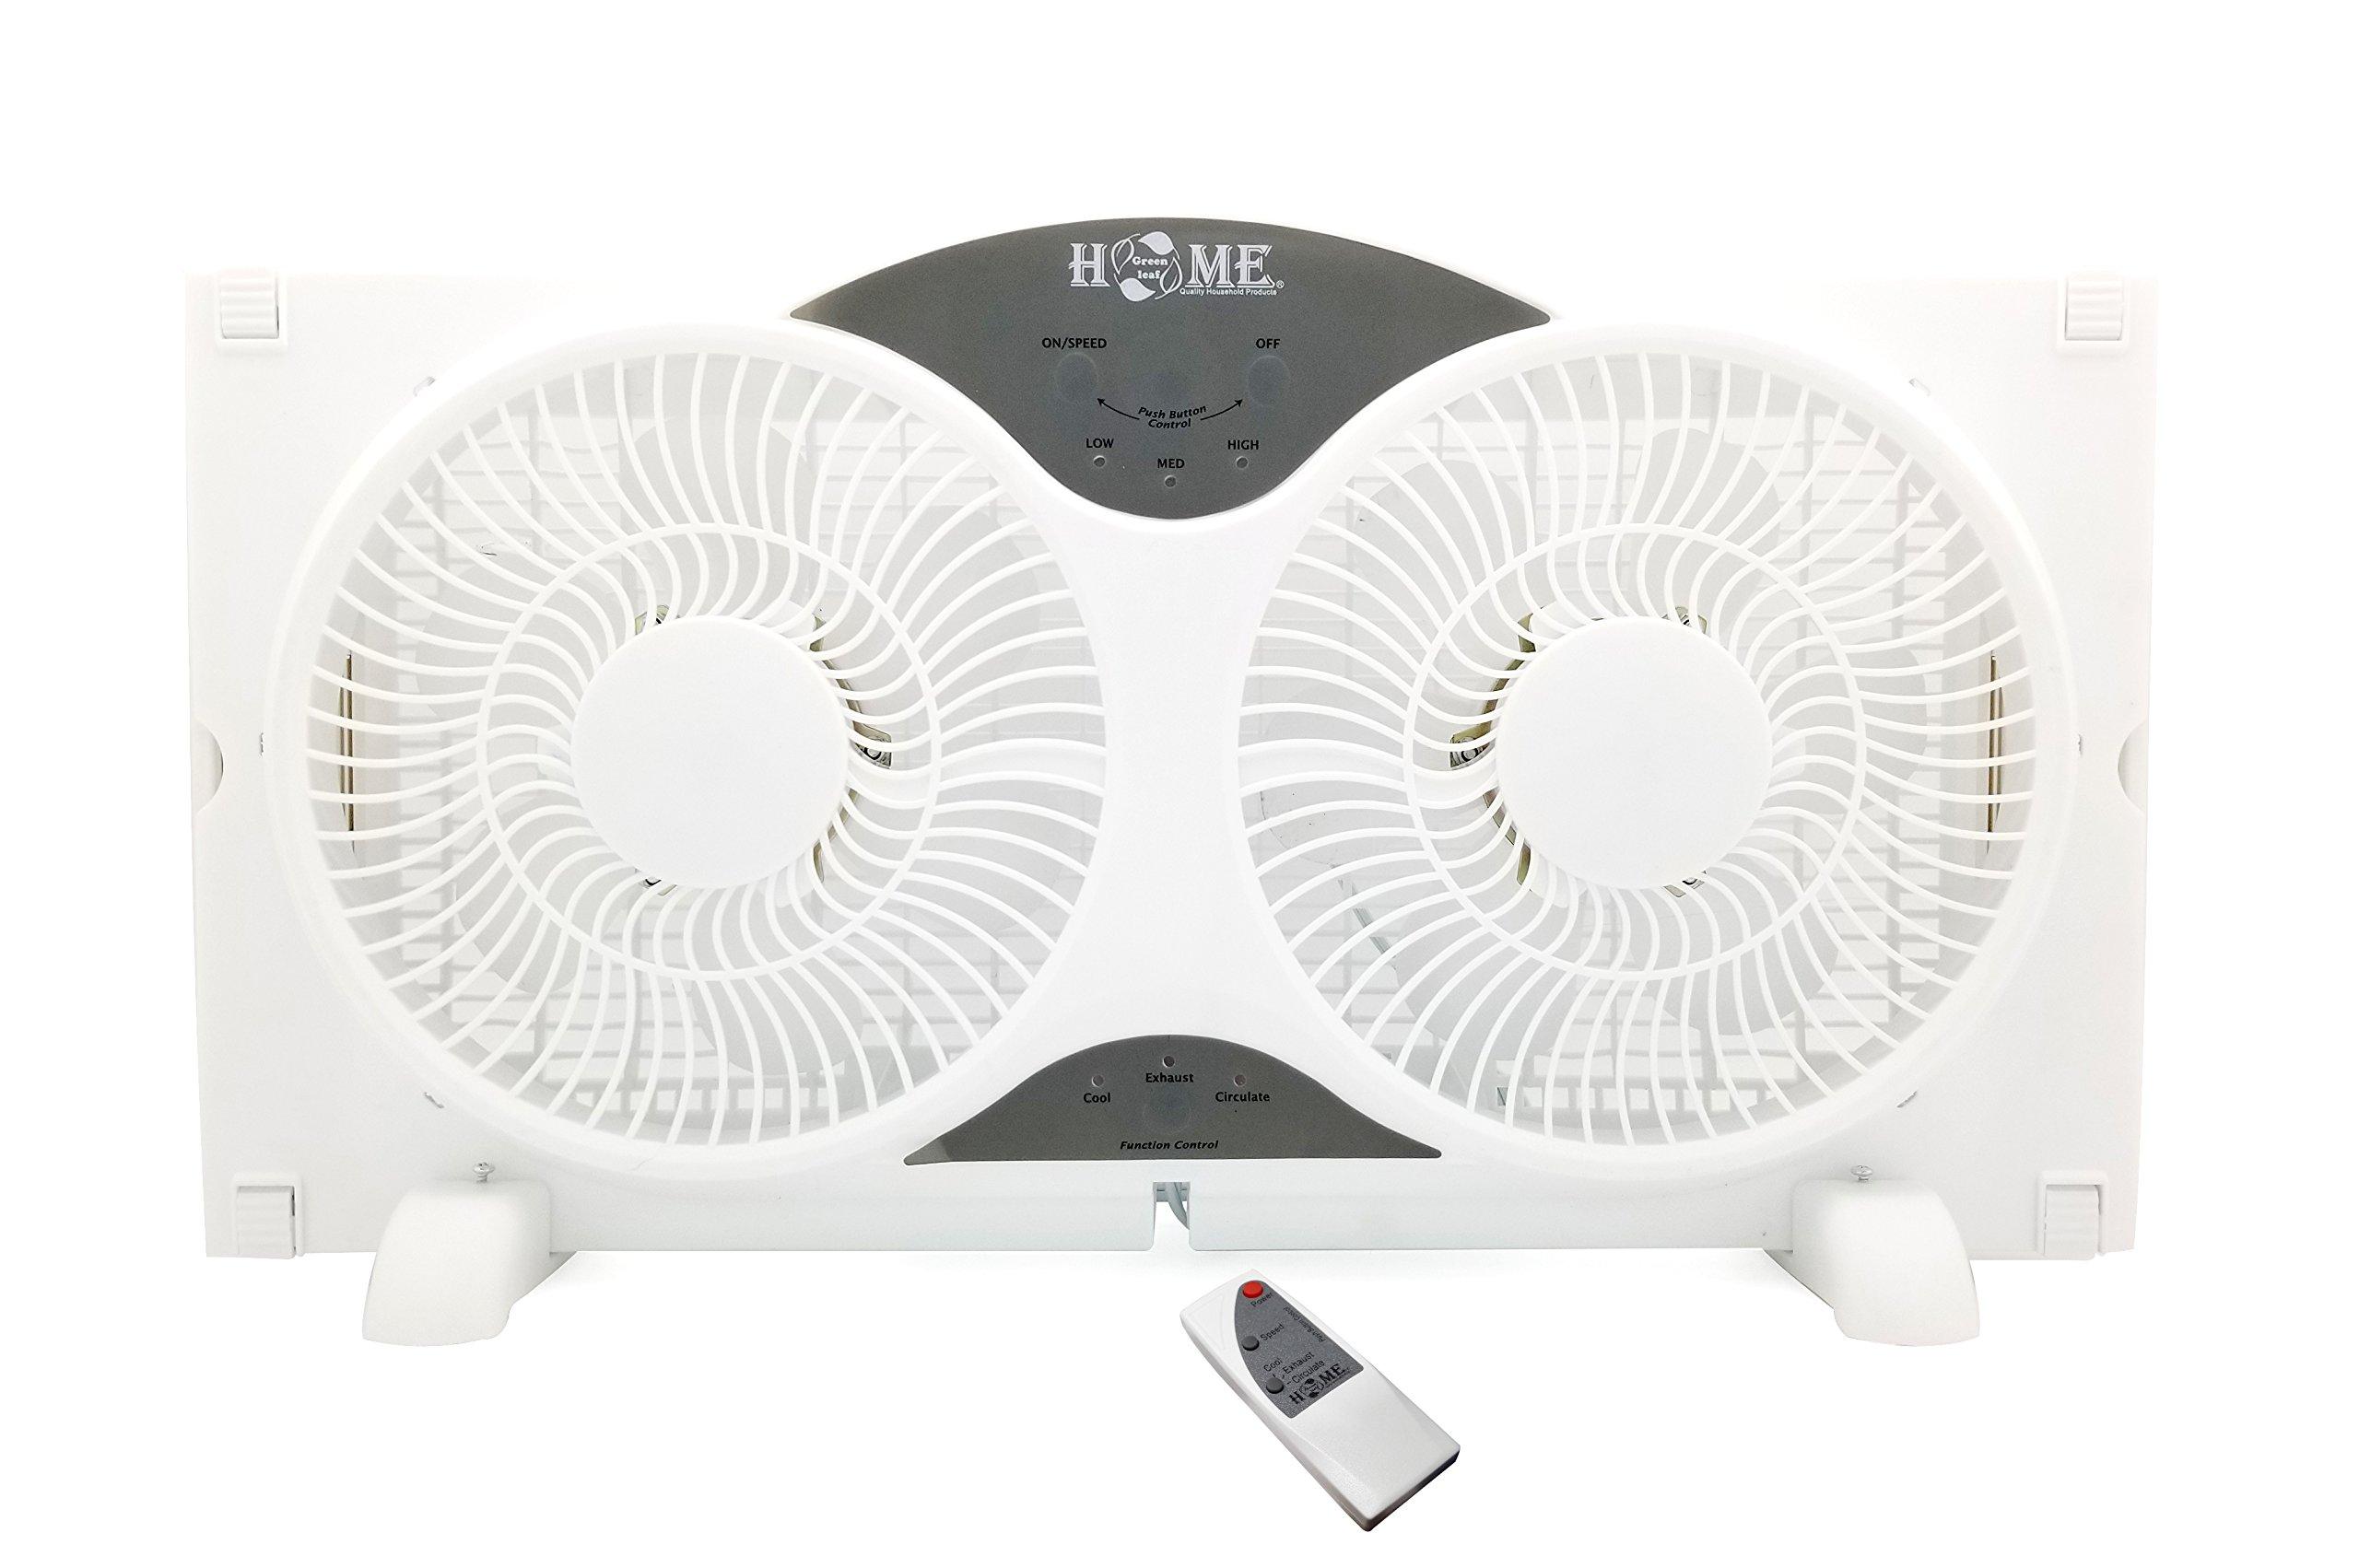 8061 Uniware 9'' Twin Window Fan, 3 Speed, 3 Fand Function, with Etl Certification, with Remote